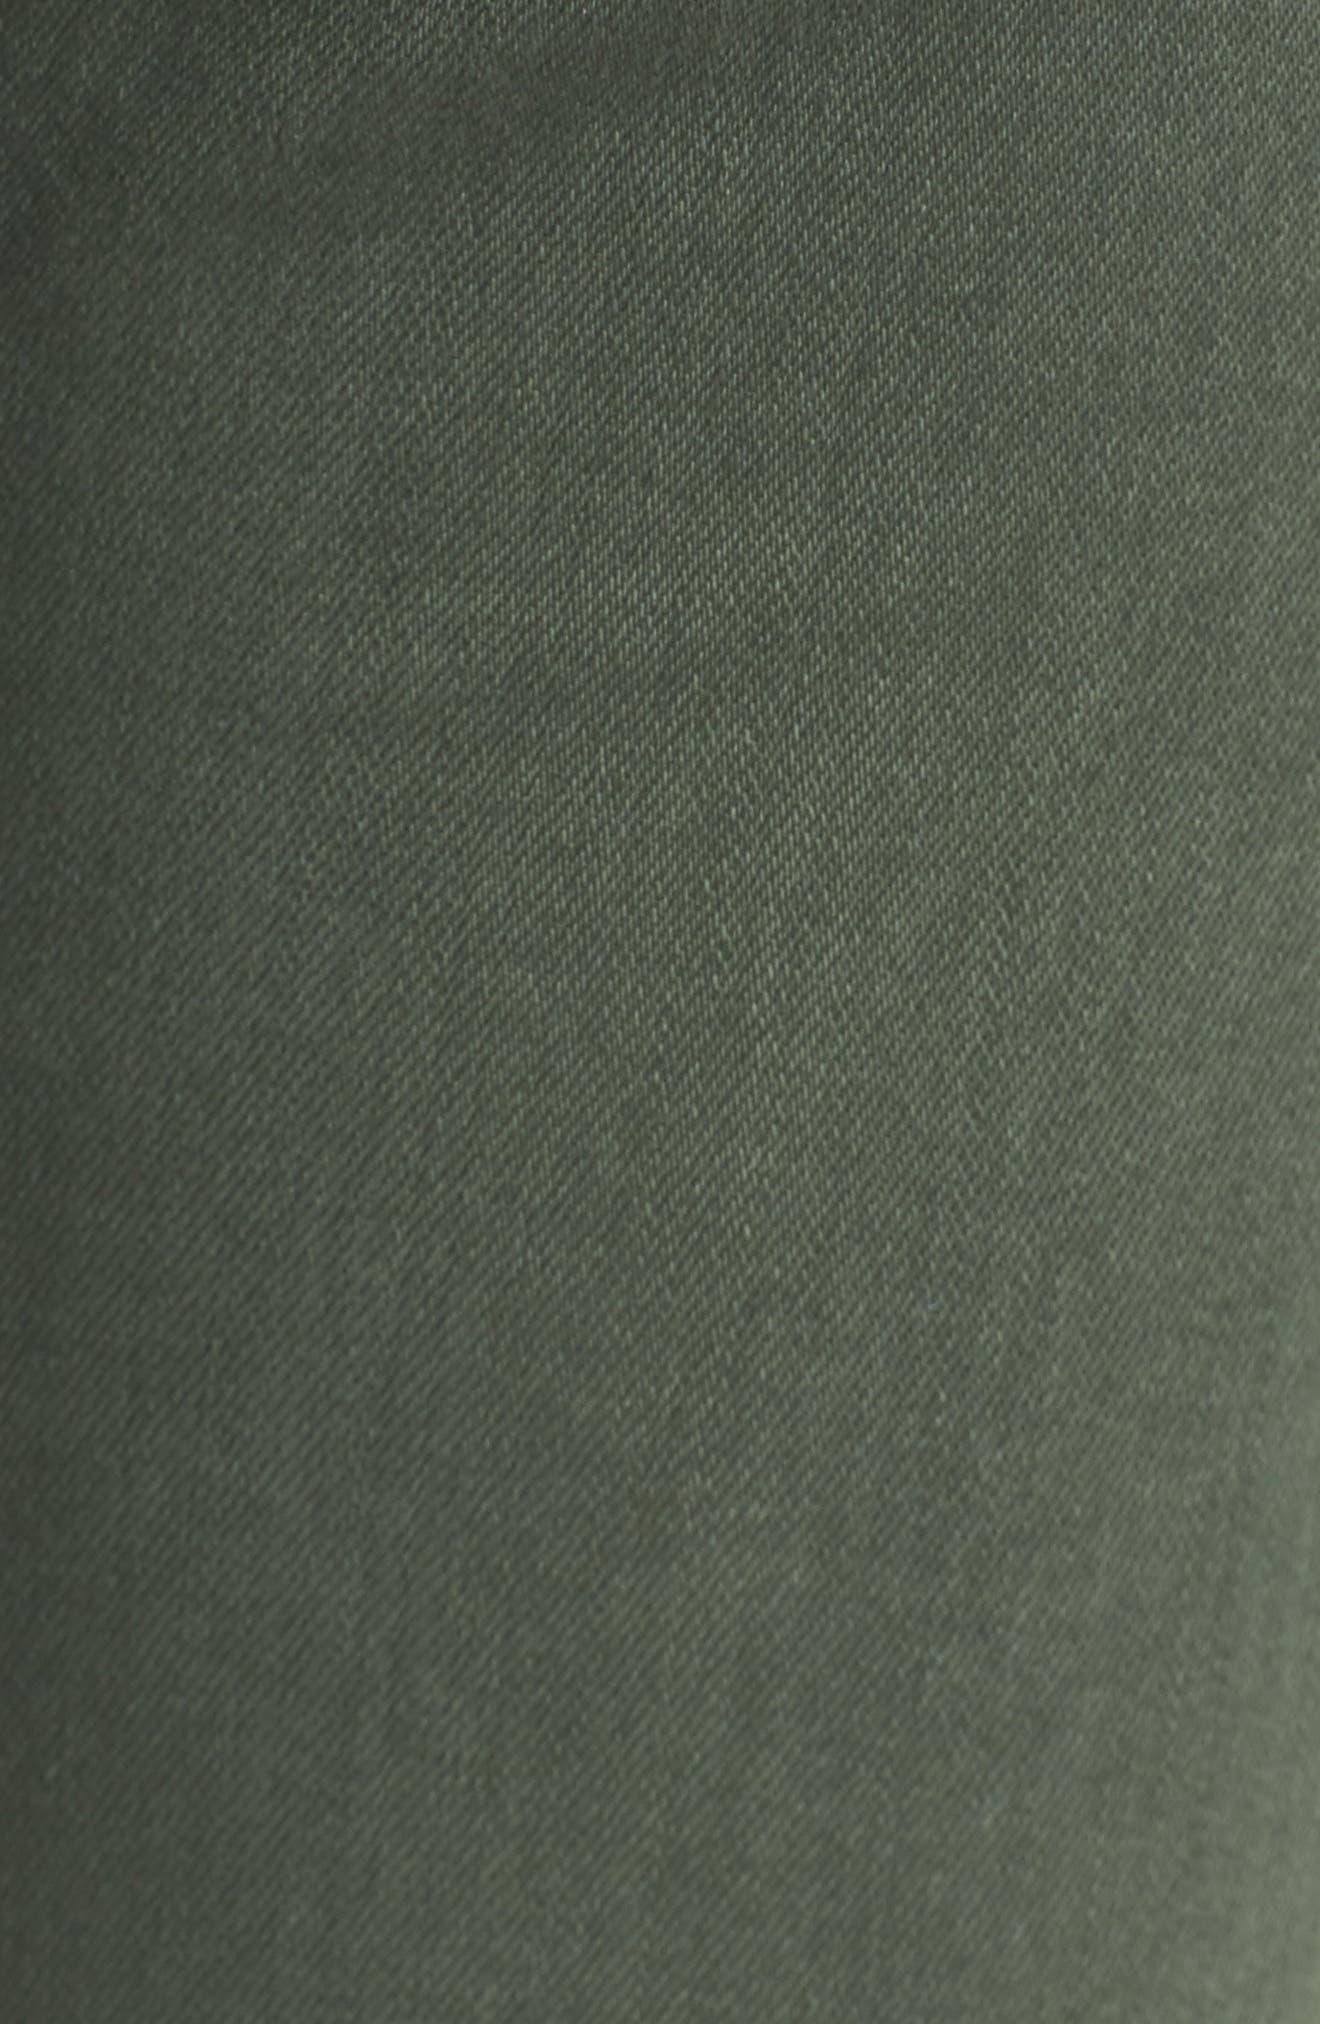 The Isabelle High Waist Crop Straight Leg Jeans,                             Alternate thumbnail 6, color,                             1 Year Sulfur Desert Pine